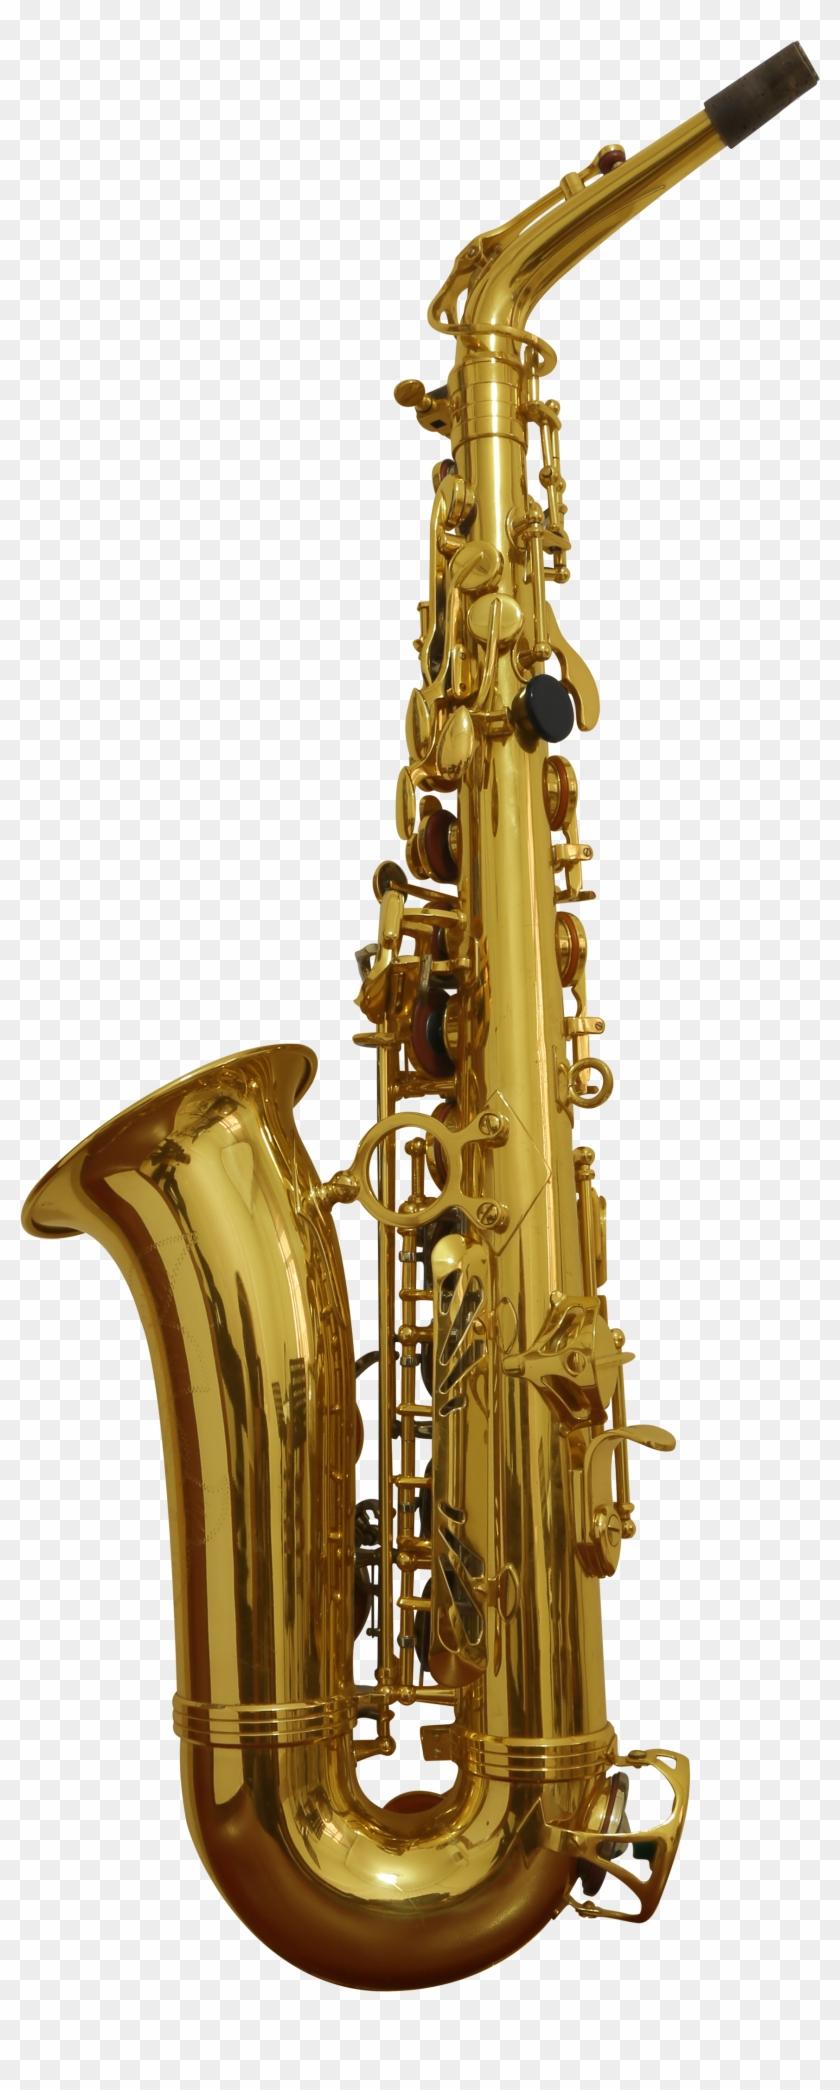 Saxophone Png Clip Art - High Resolution Saxophone Art Transparent Png #323299